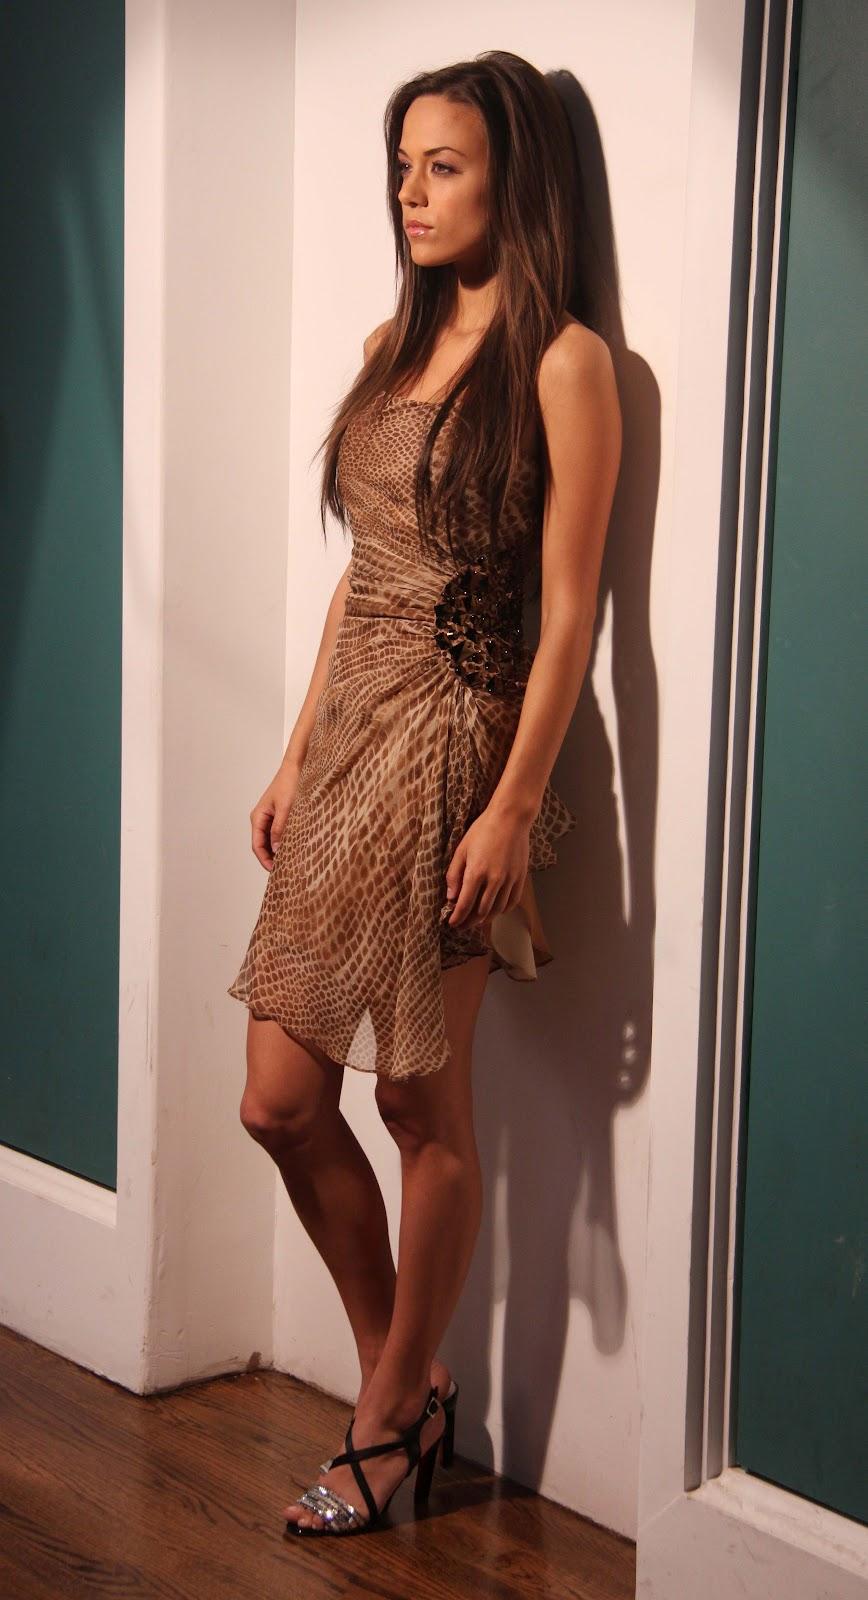 Jana Kramer latest hot photoshoot ~ world actress photos,Bollywood,Hollywood hot actress photos